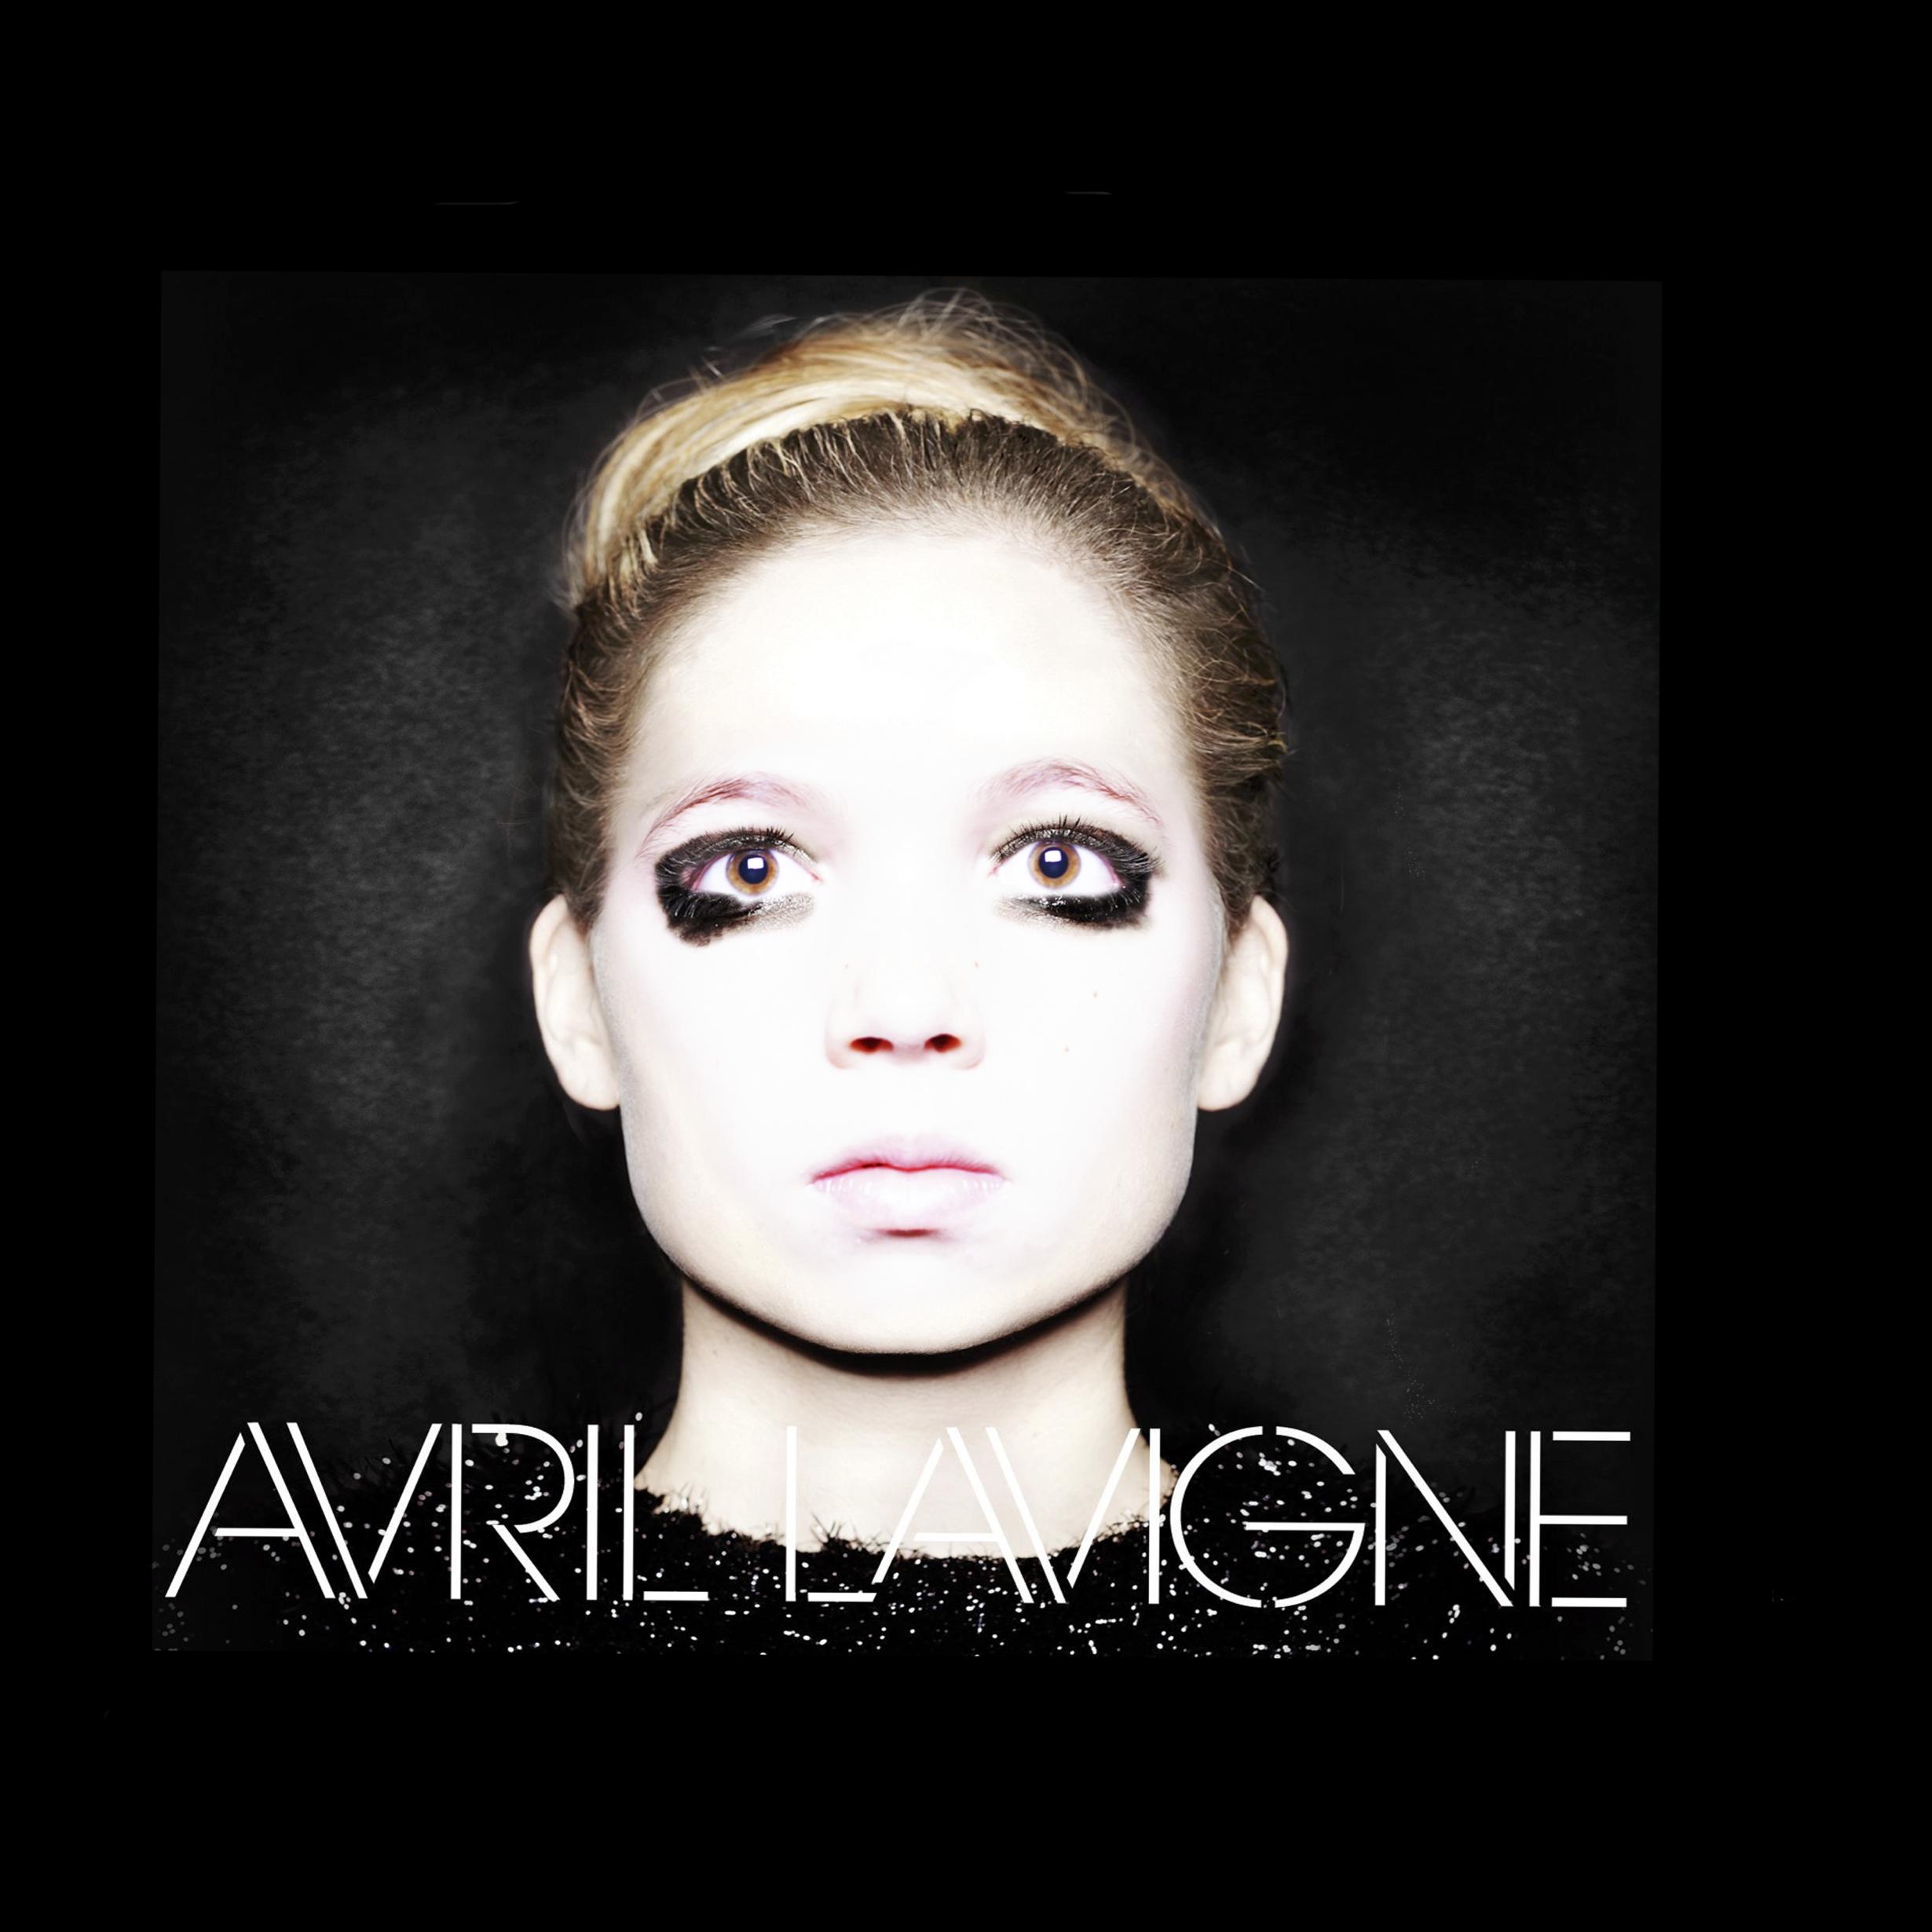 6.7 - Photoshop - Alexandra Isman - Avril Lavigne.png